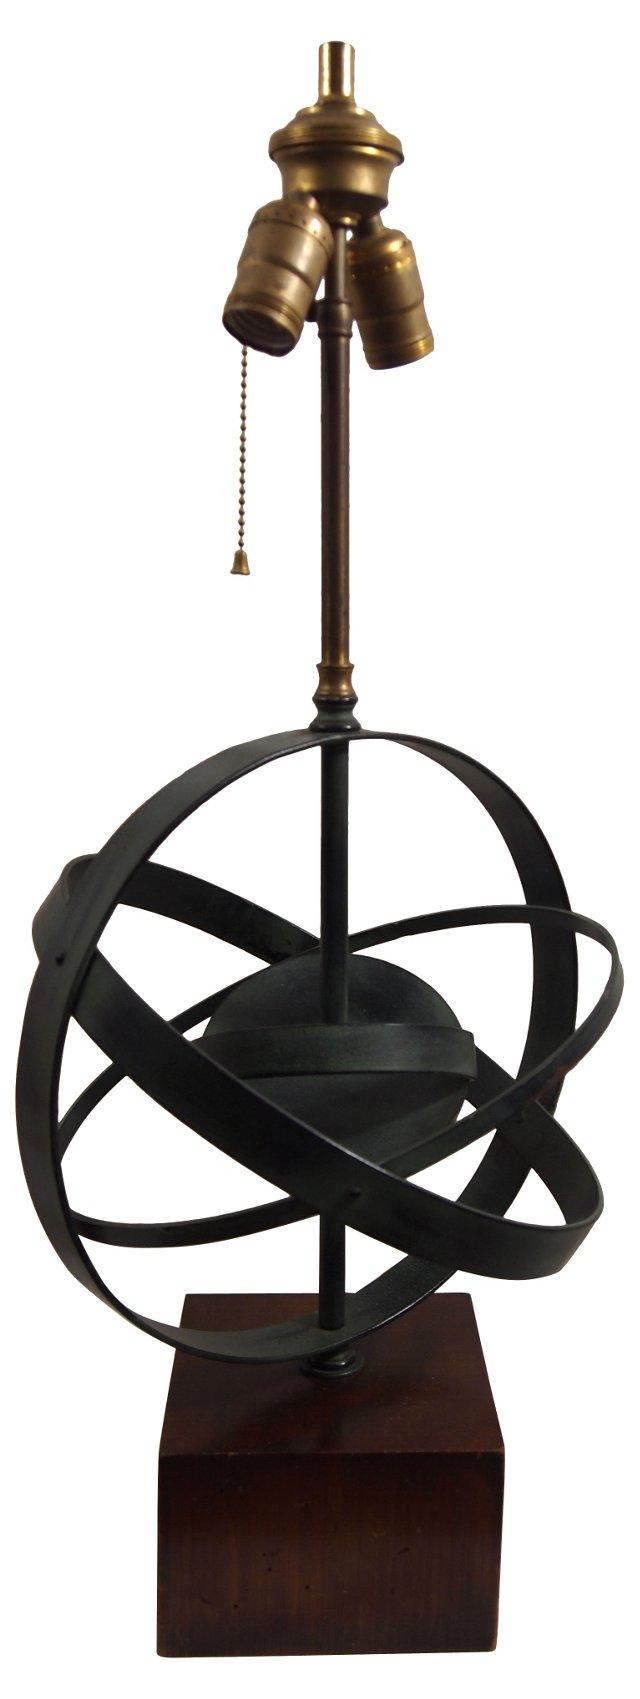 Midcentury Armillary Sphere Lamp